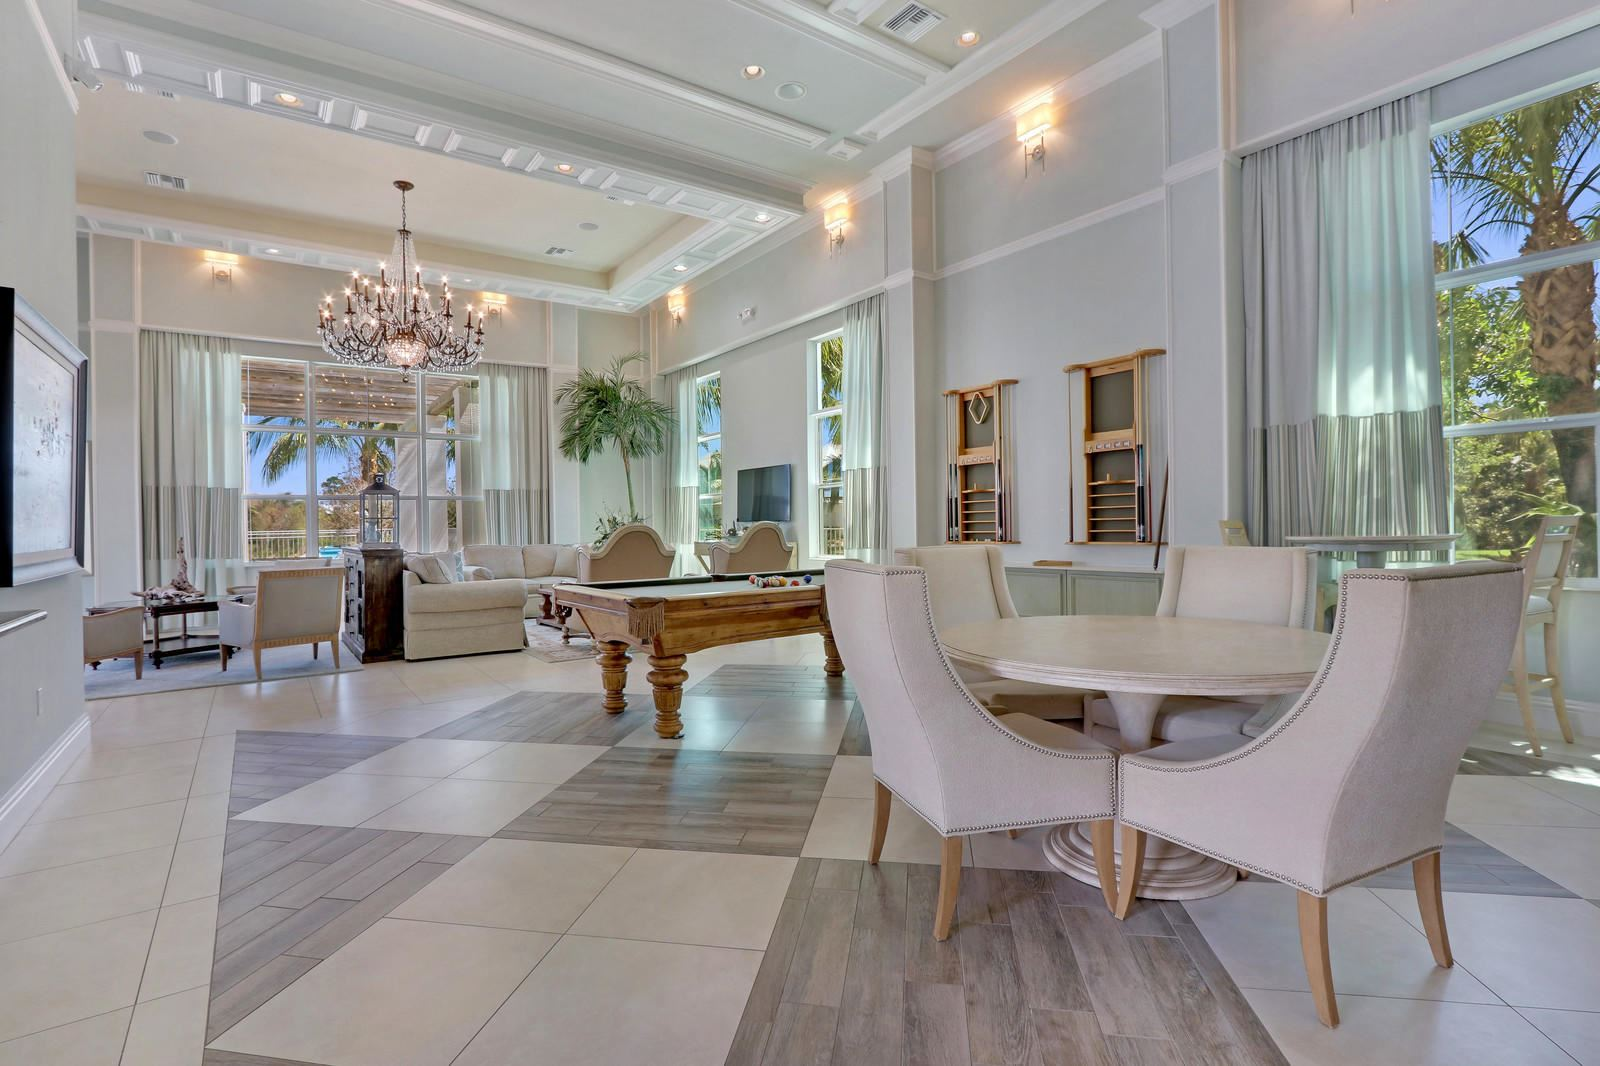 Photo of 7117 Kensington Court, Palm Beach Gardens, FL 33418 (MLS # RX-10697071)